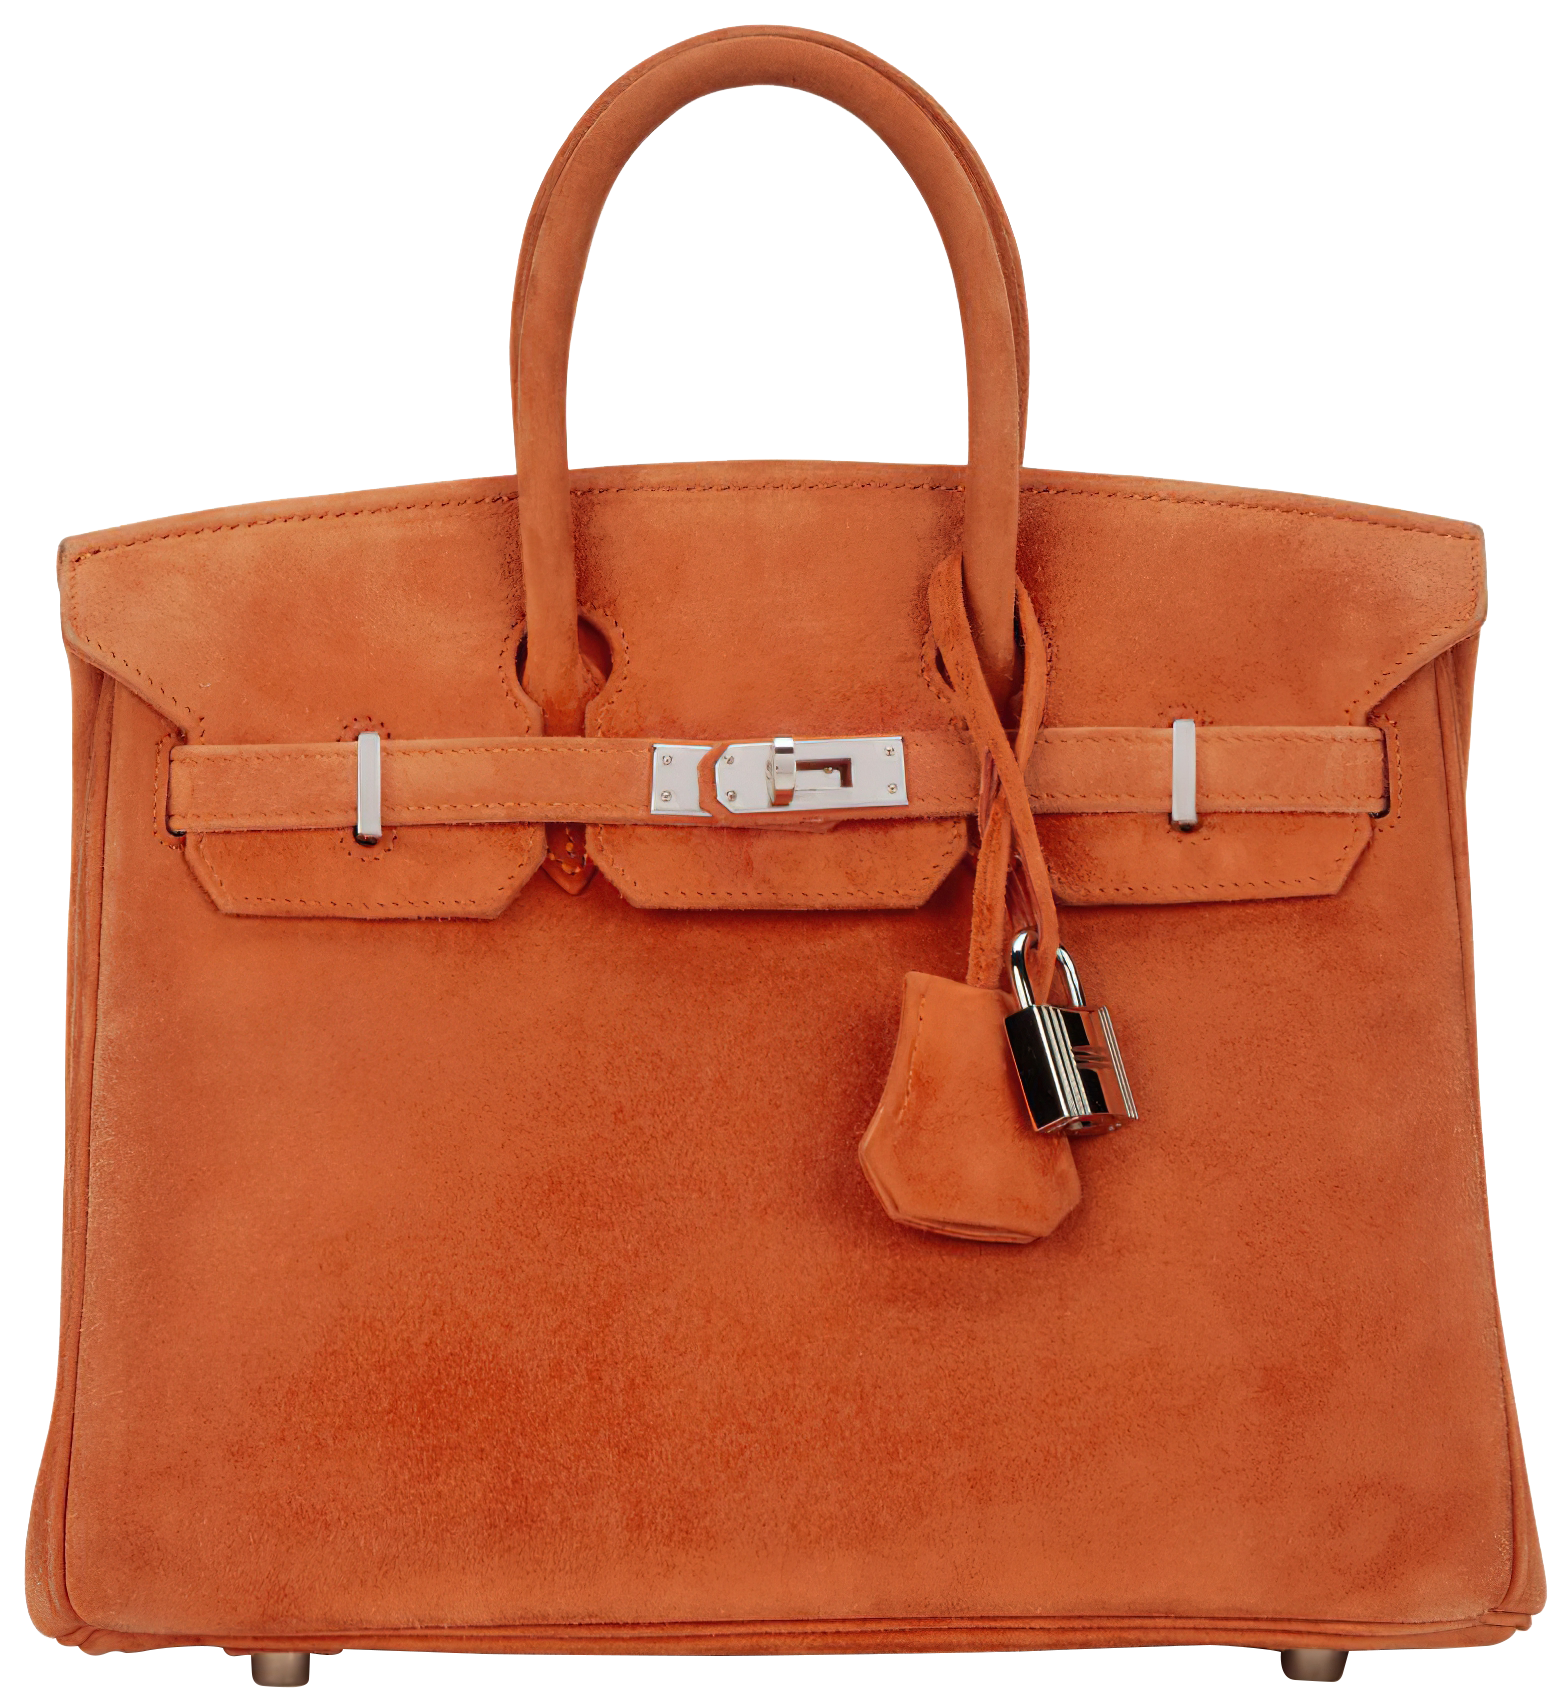 orange-veau-doblis-birkin-25cm-palladium-hardware-6f34